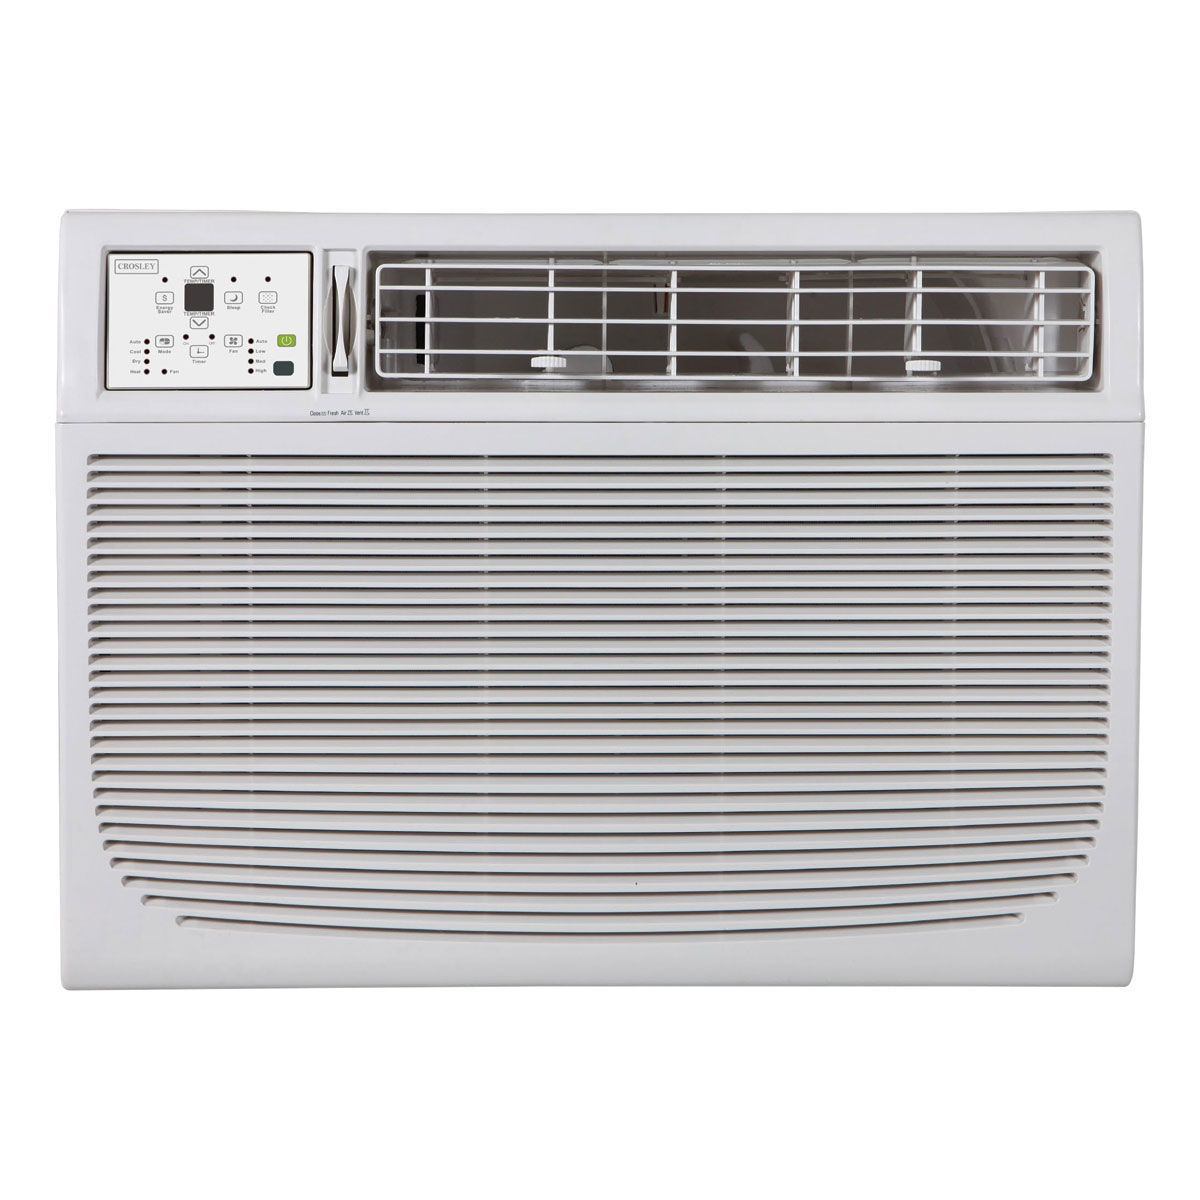 Picture of CROSLEY 18500 BTU AIR CONDITIONER/HEAT